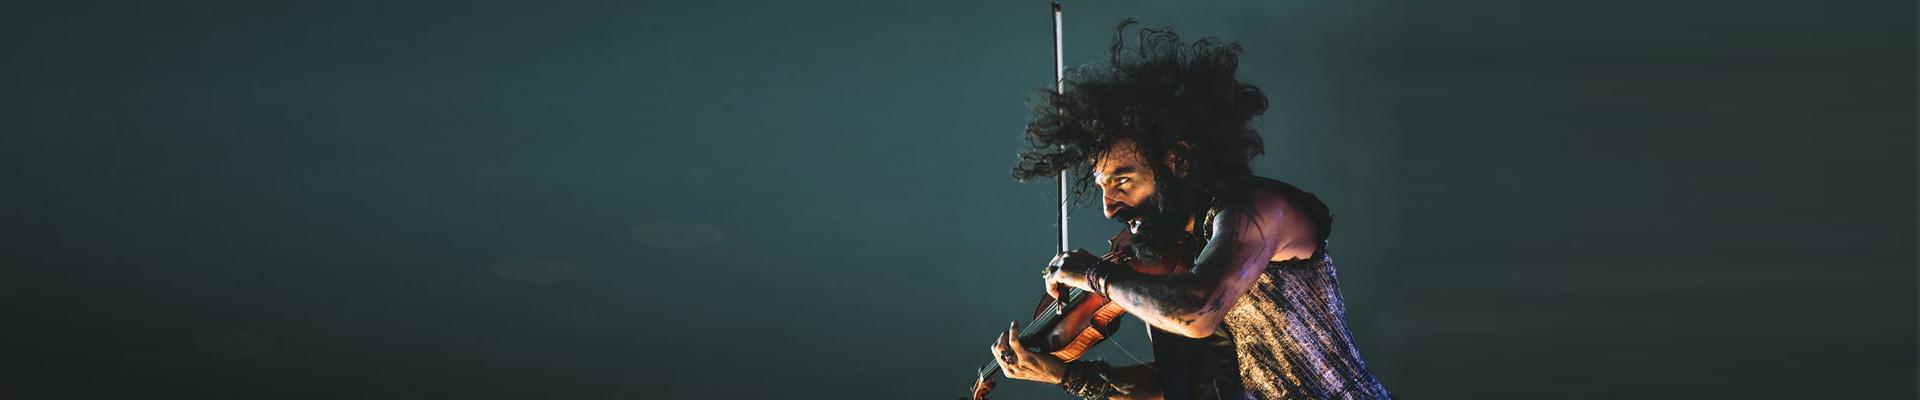 Ara Malikian – The Incredible World Tour of Violin